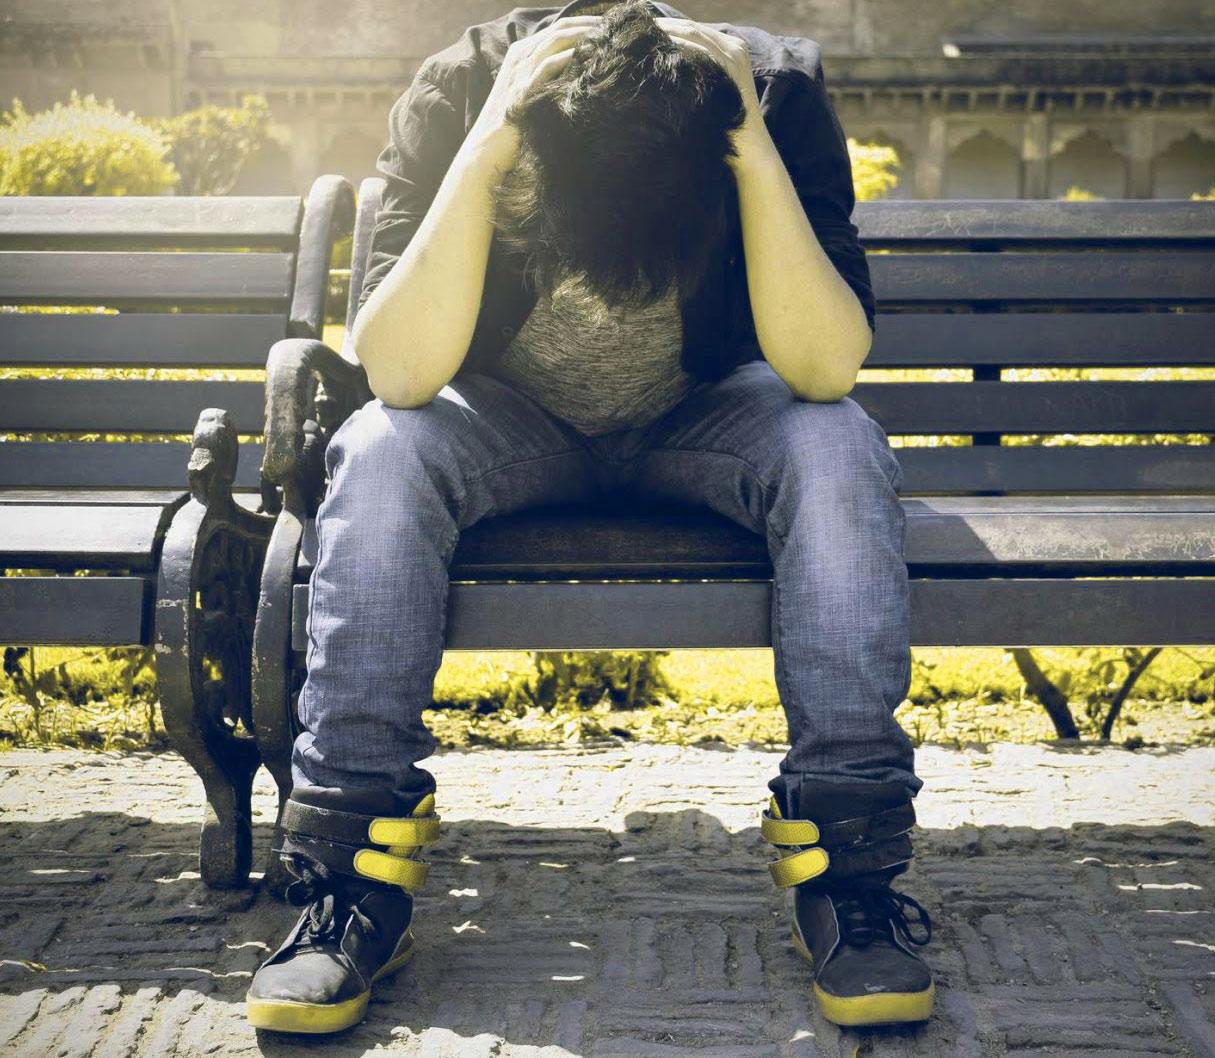 Best Quality Sad Alone boy whatsapp dp Images 3